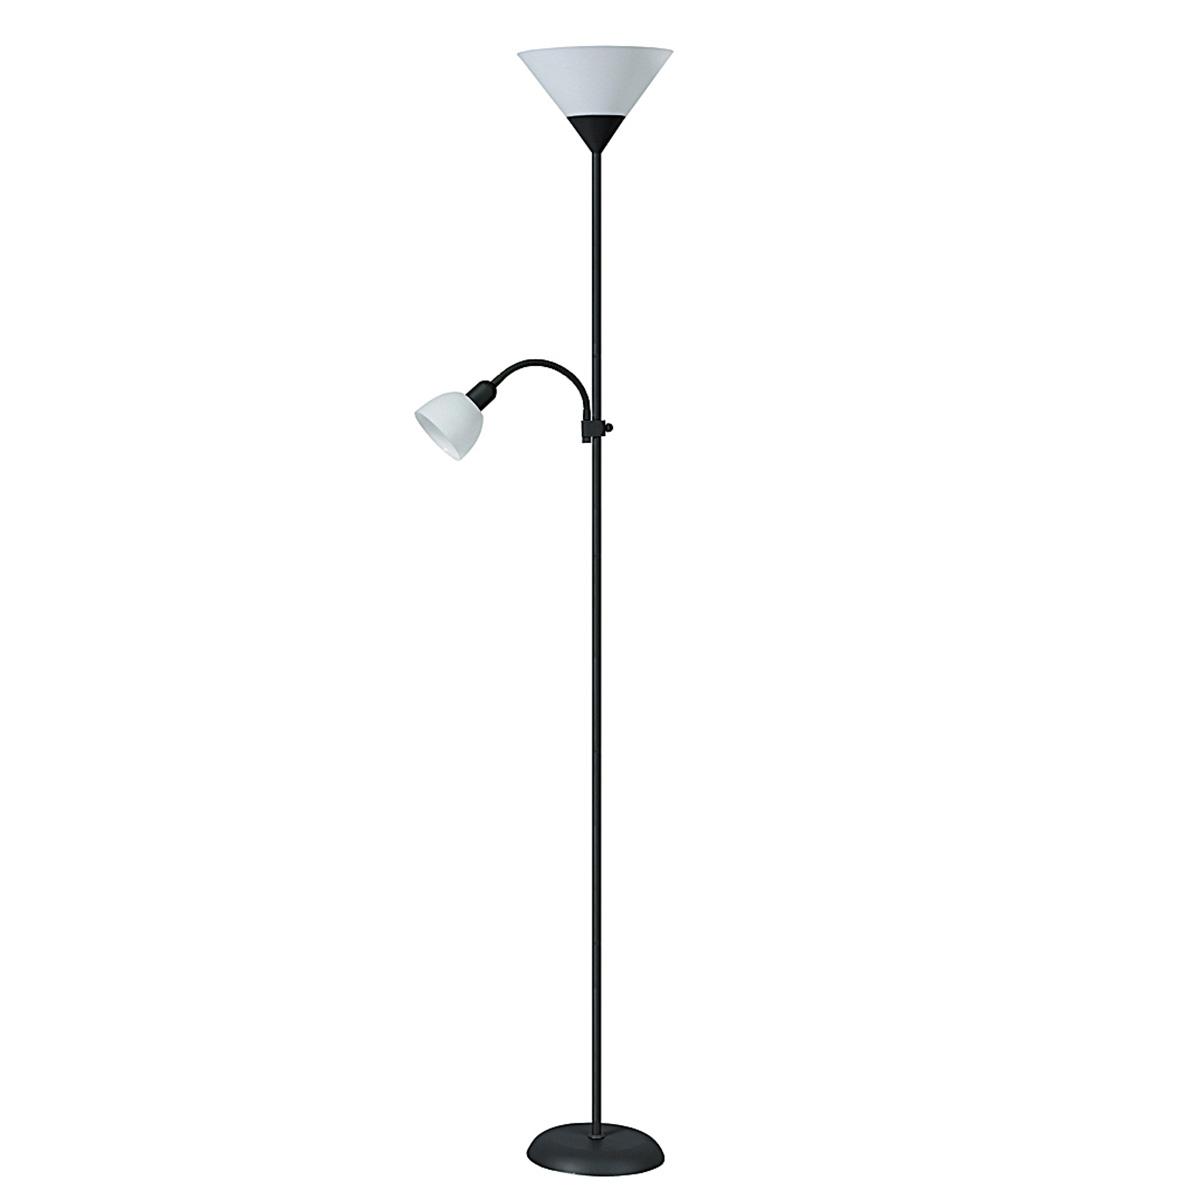 Podna lampa Action 4062 crna